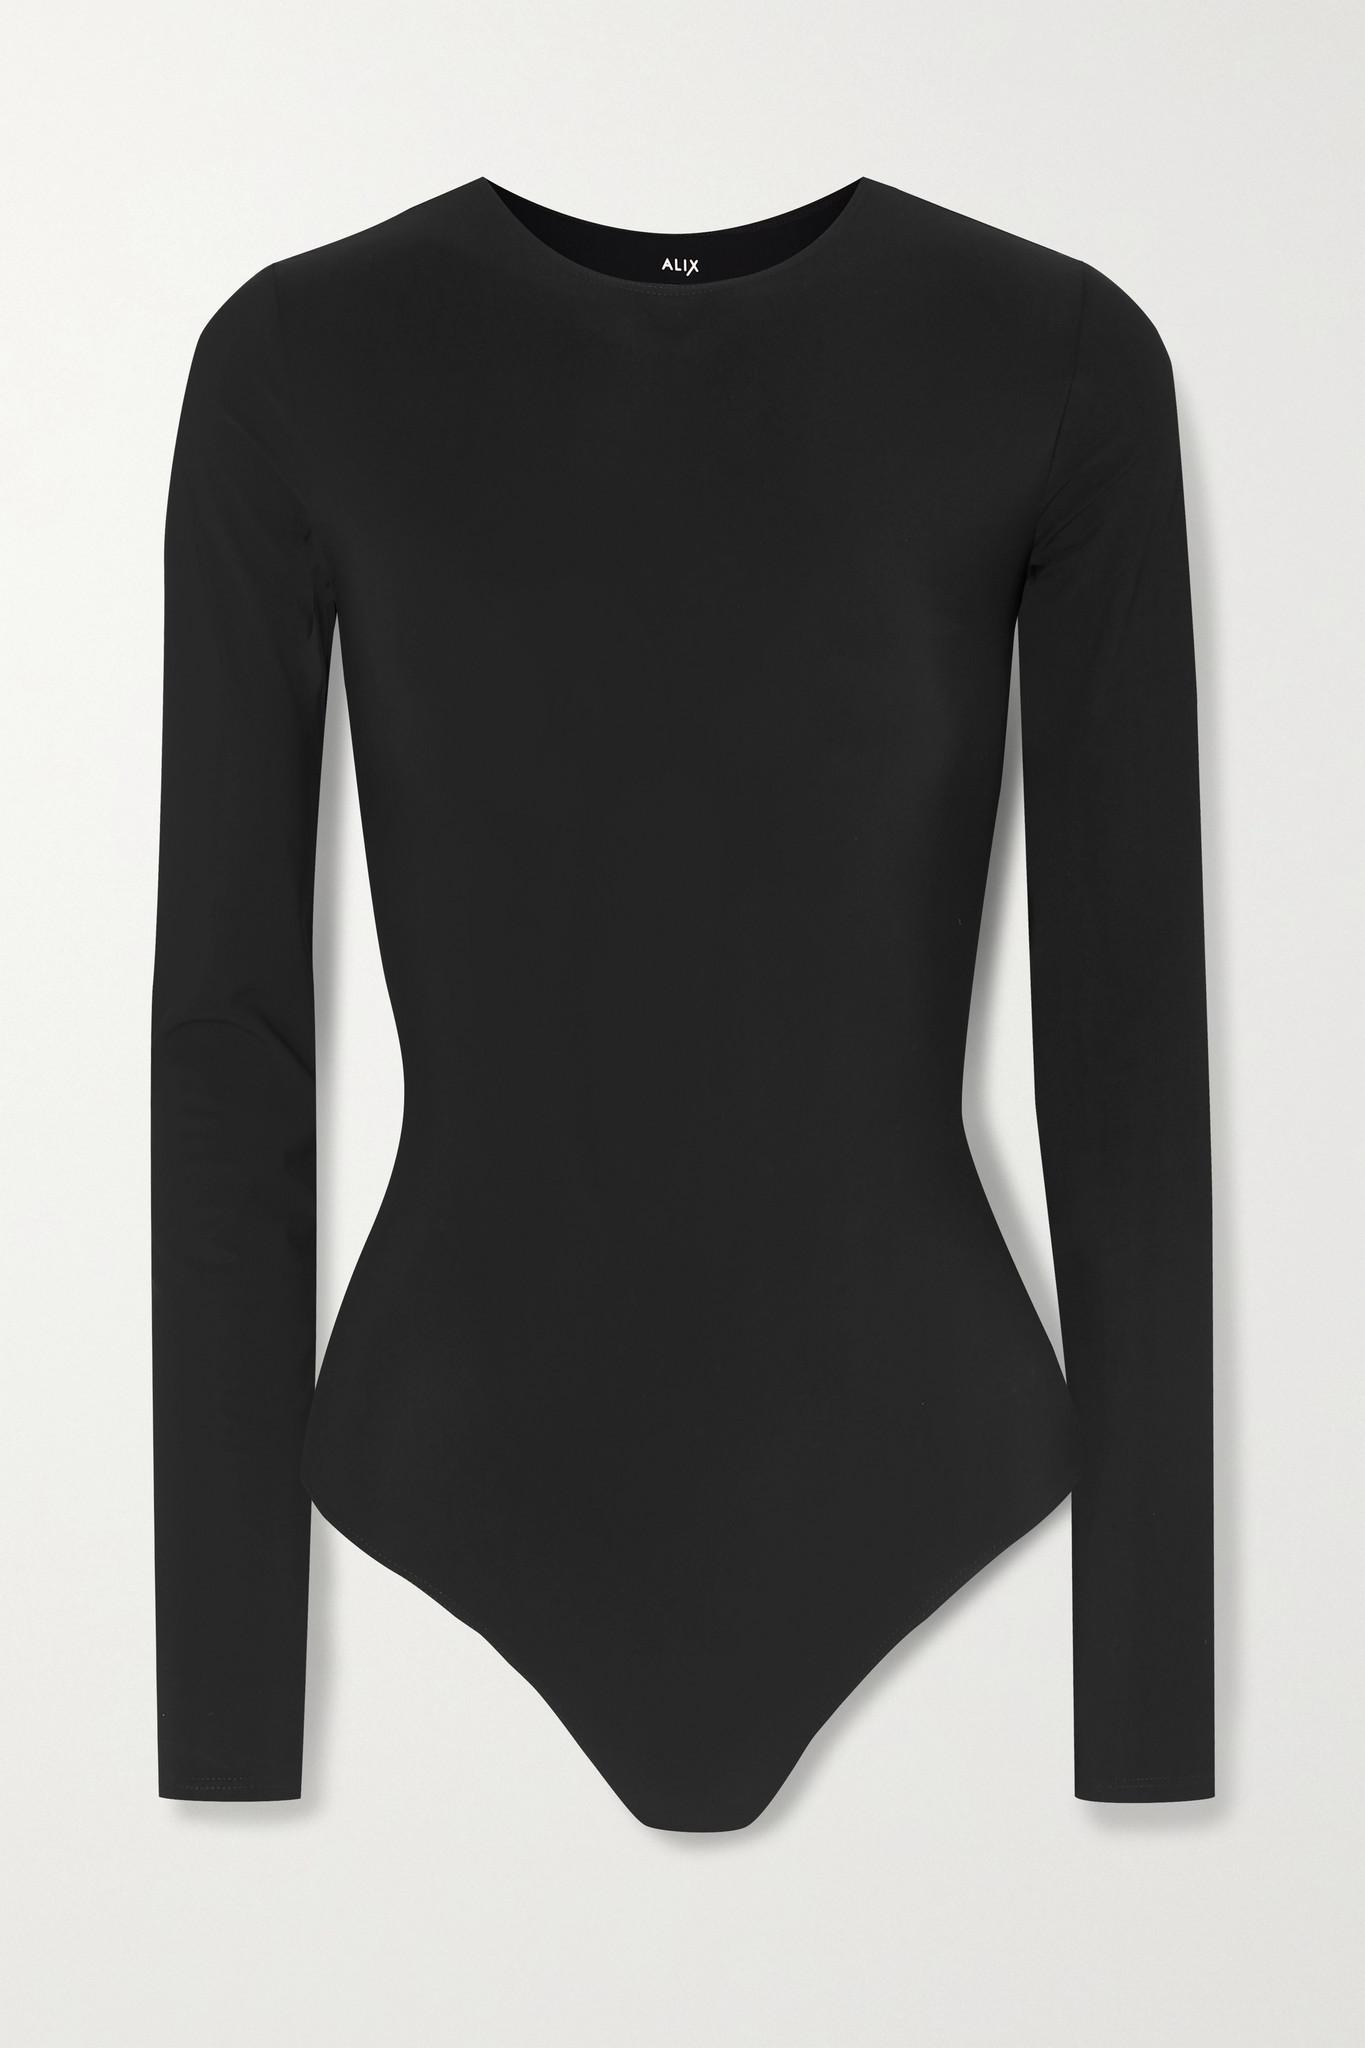 ALIX NYC - Leroy Stretch-jersey Thong Bodysuit - Black - large